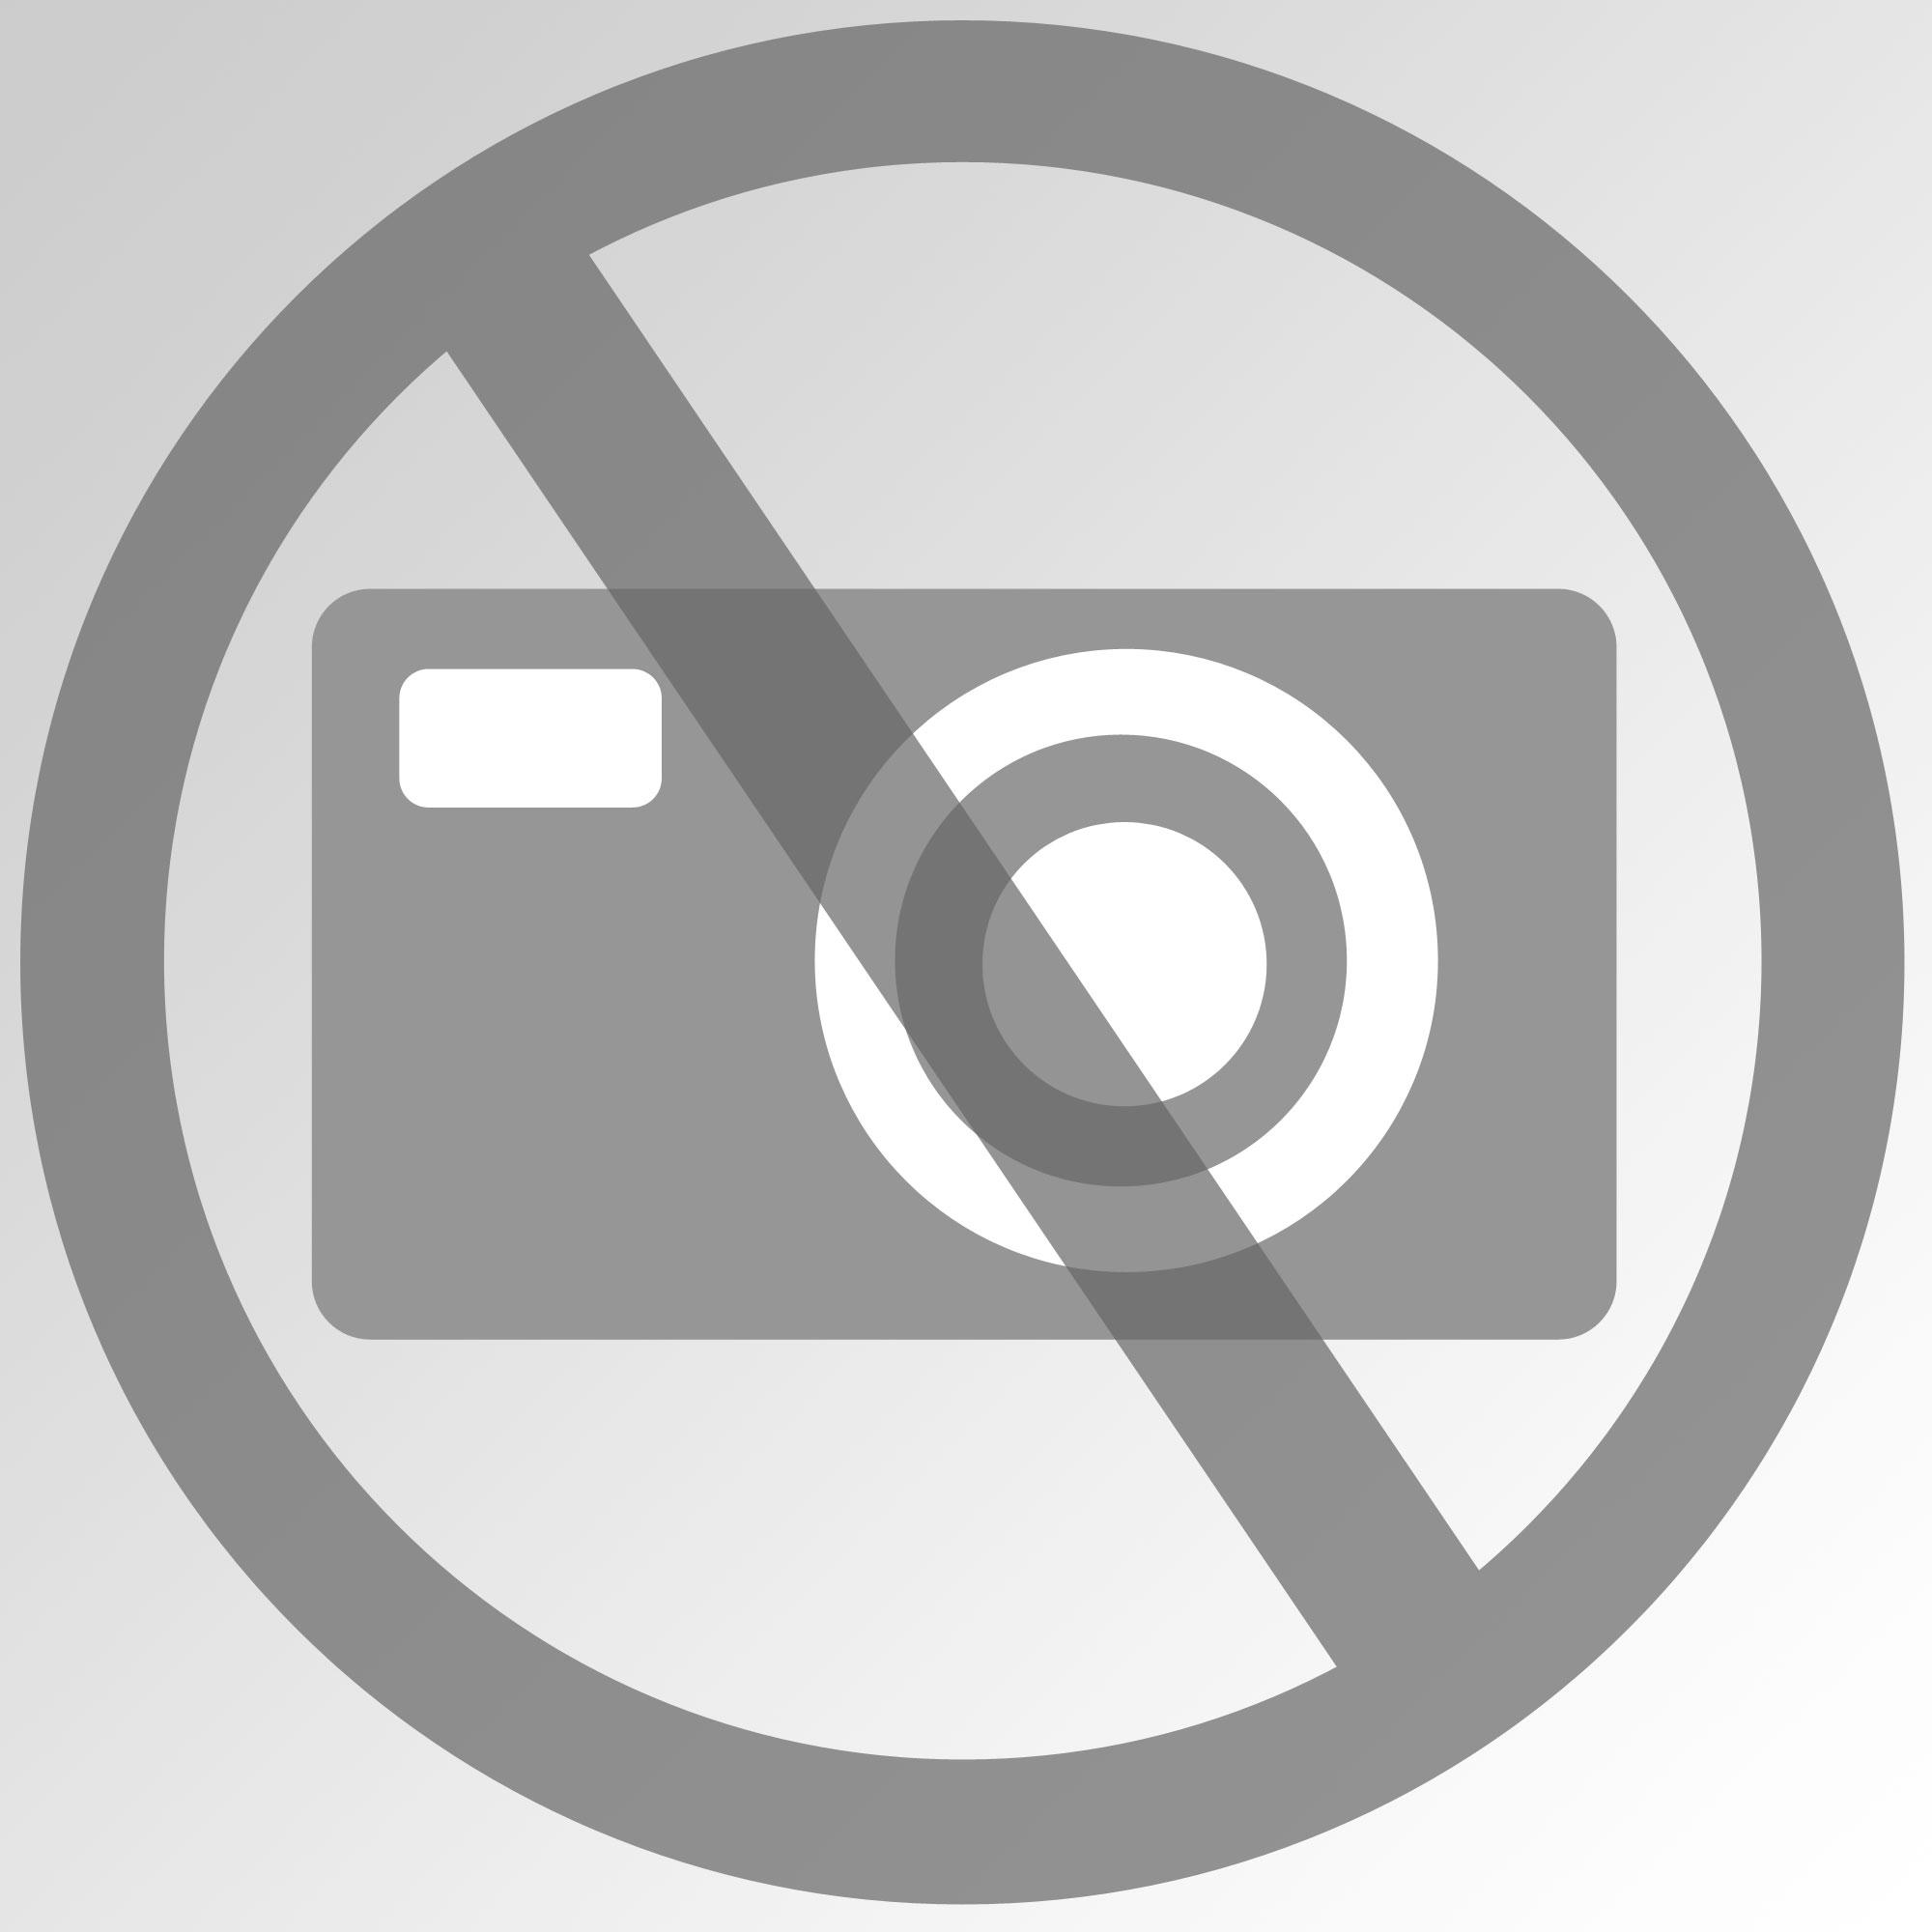 Kleen Purgatis Trymat Ultra 60 Tabs à 18g im Pack